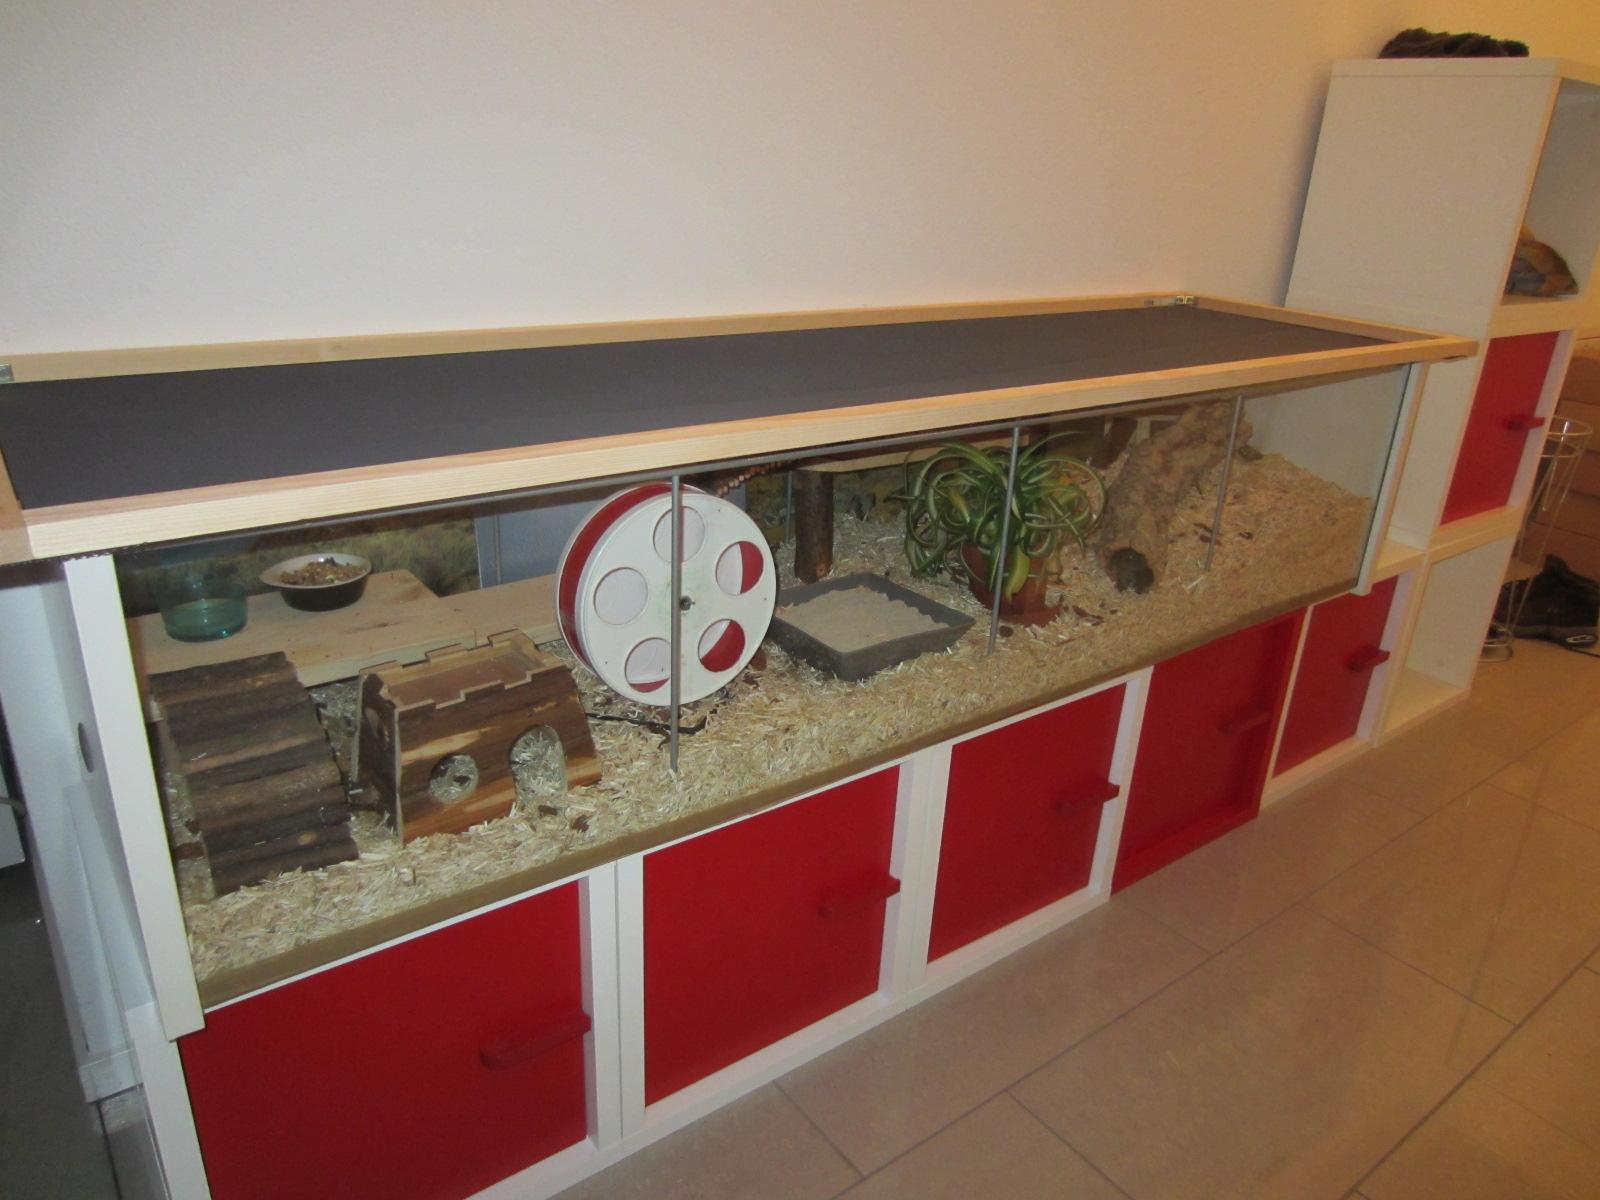 Natura animali approfondimento gabbia per criceti nani for Ventose ikea